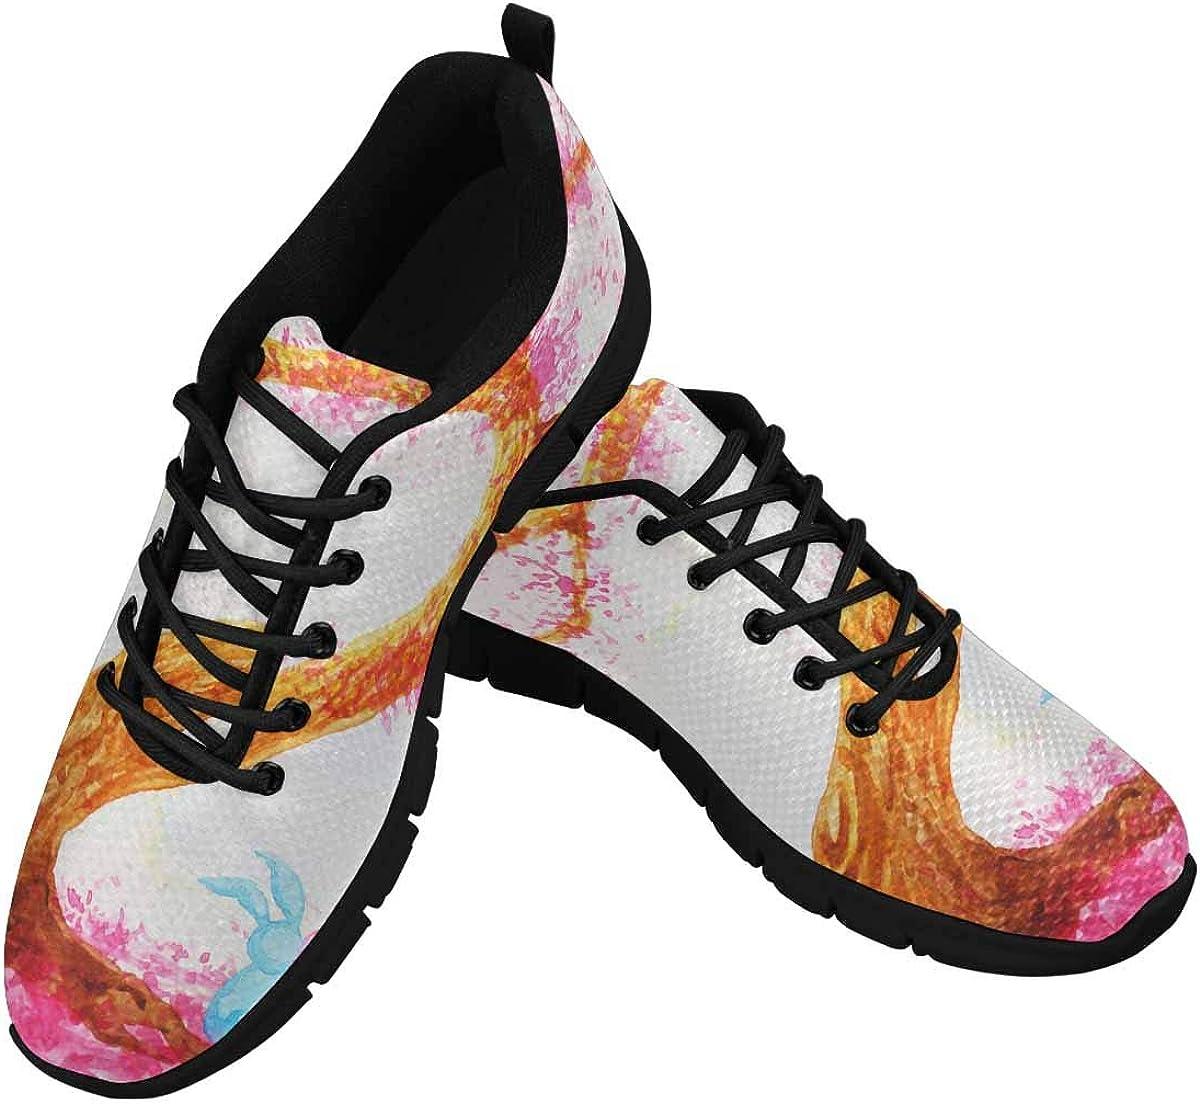 INTERESTPRINT Watercolor Rabbits Love Valentine Women's Athletic Walking Shoes Casual Mesh Comfortable Work Sneakers